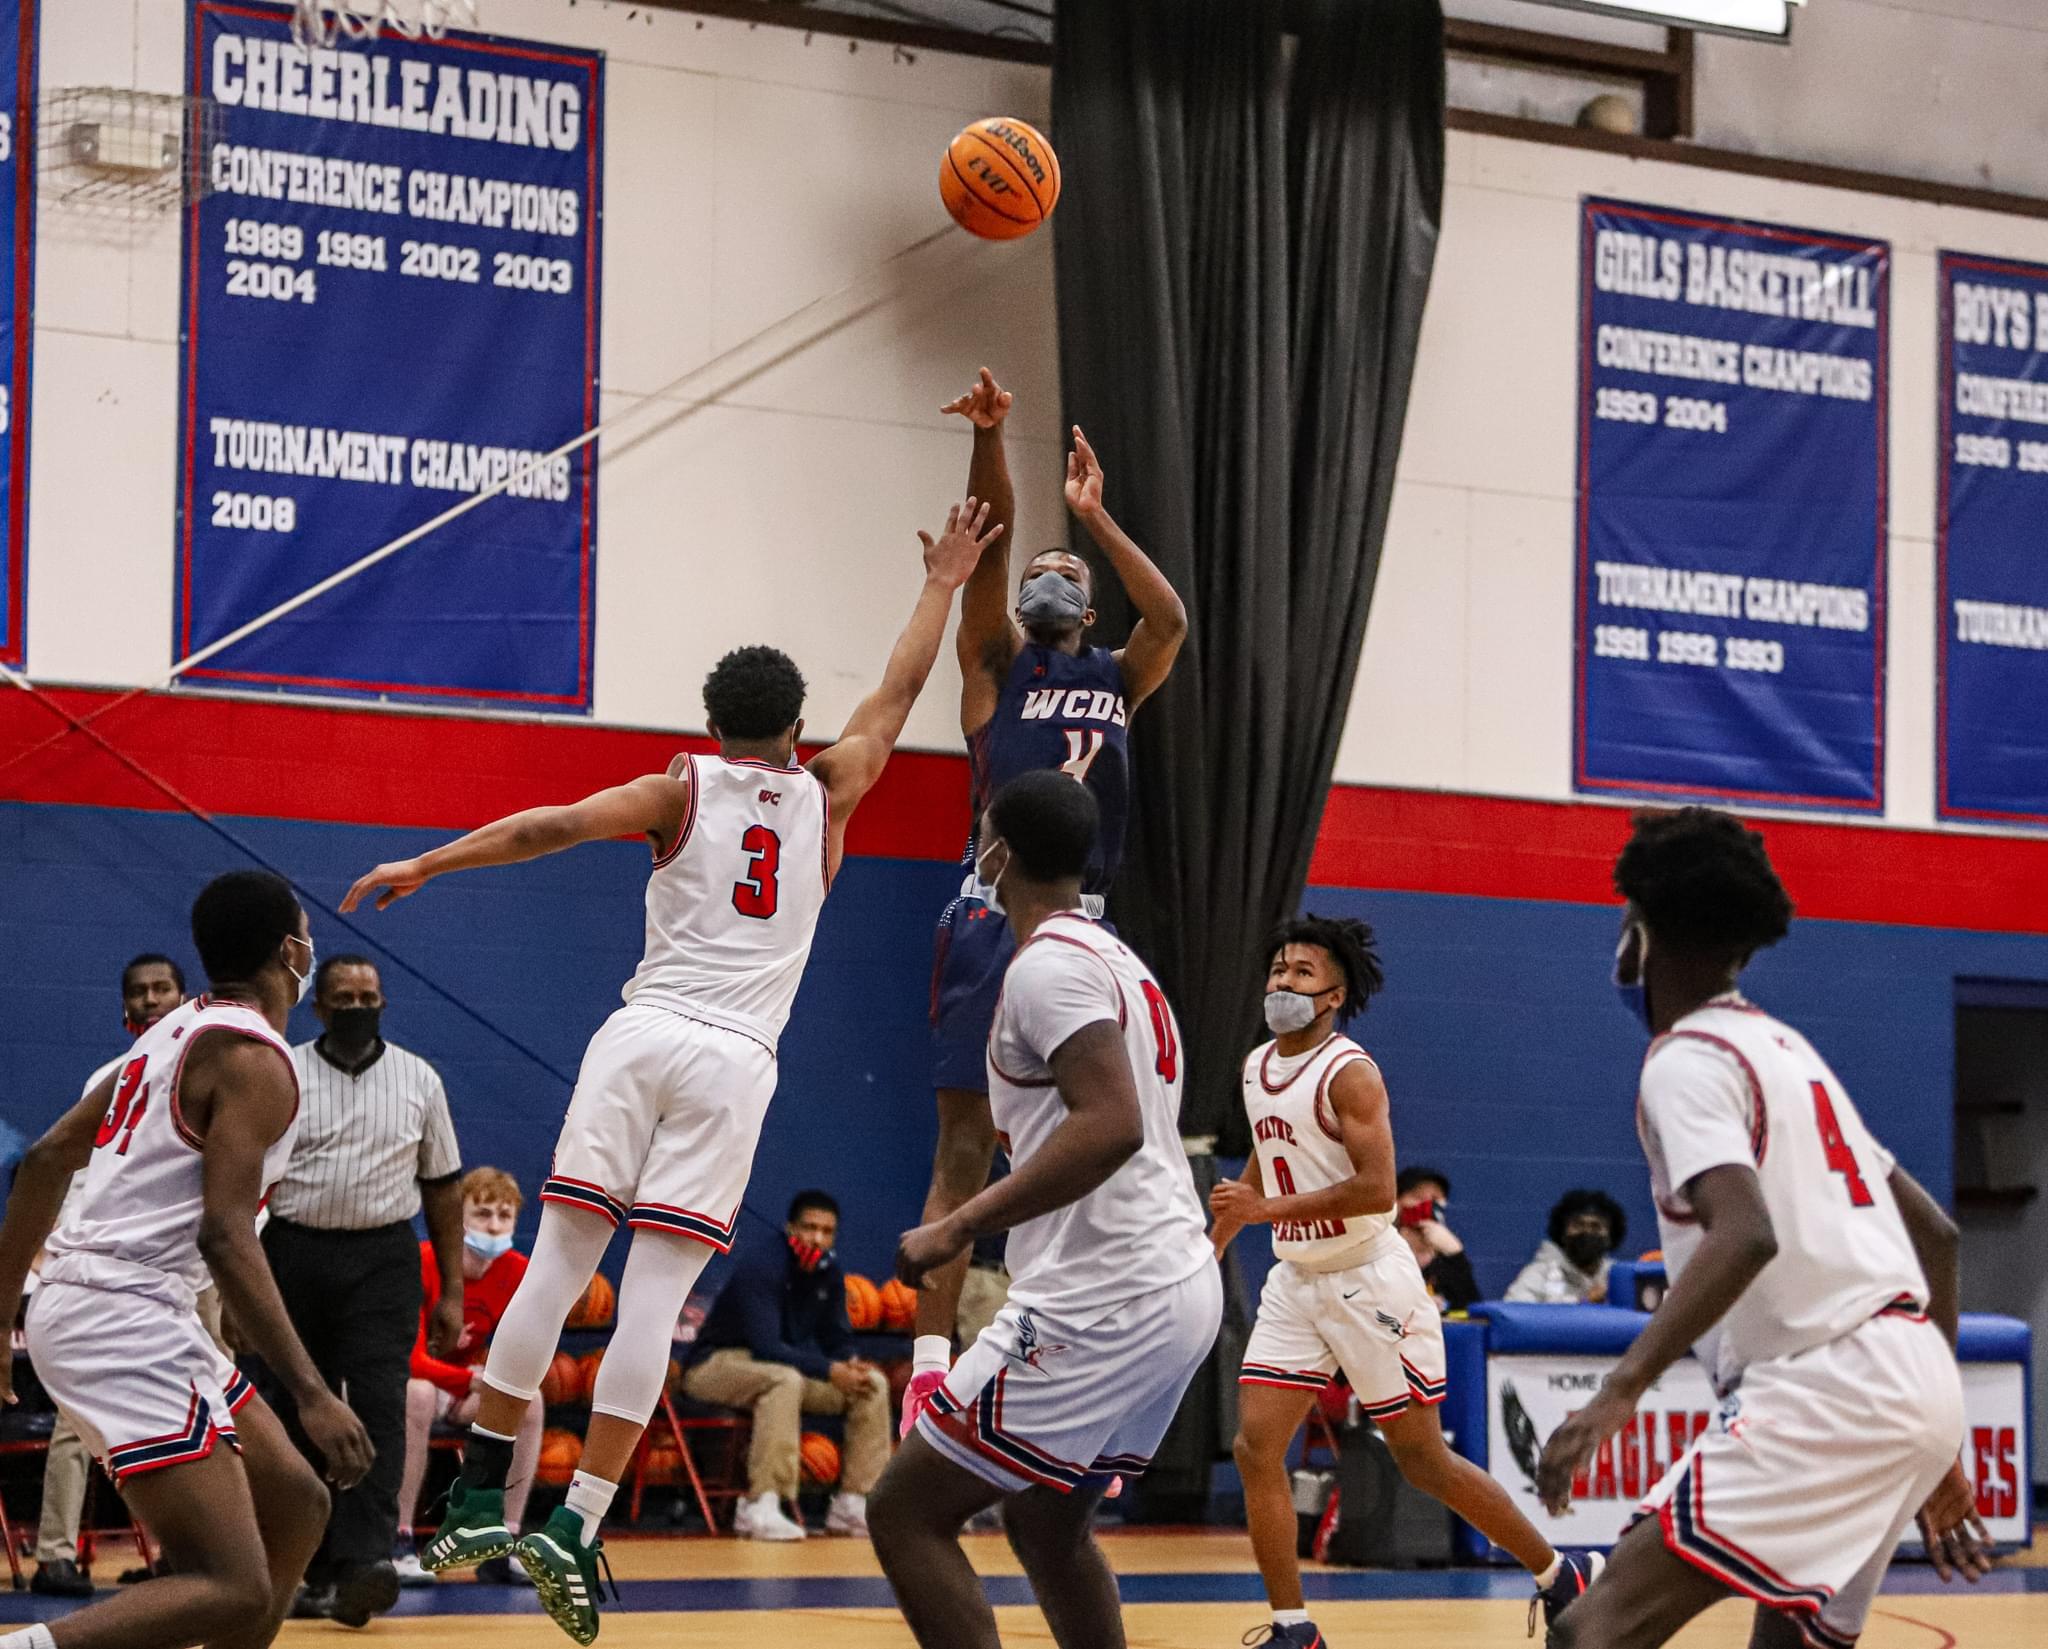 Boys Basketball: WCDS Escapes Against Wayne Christian (PHOTO GALLERY)